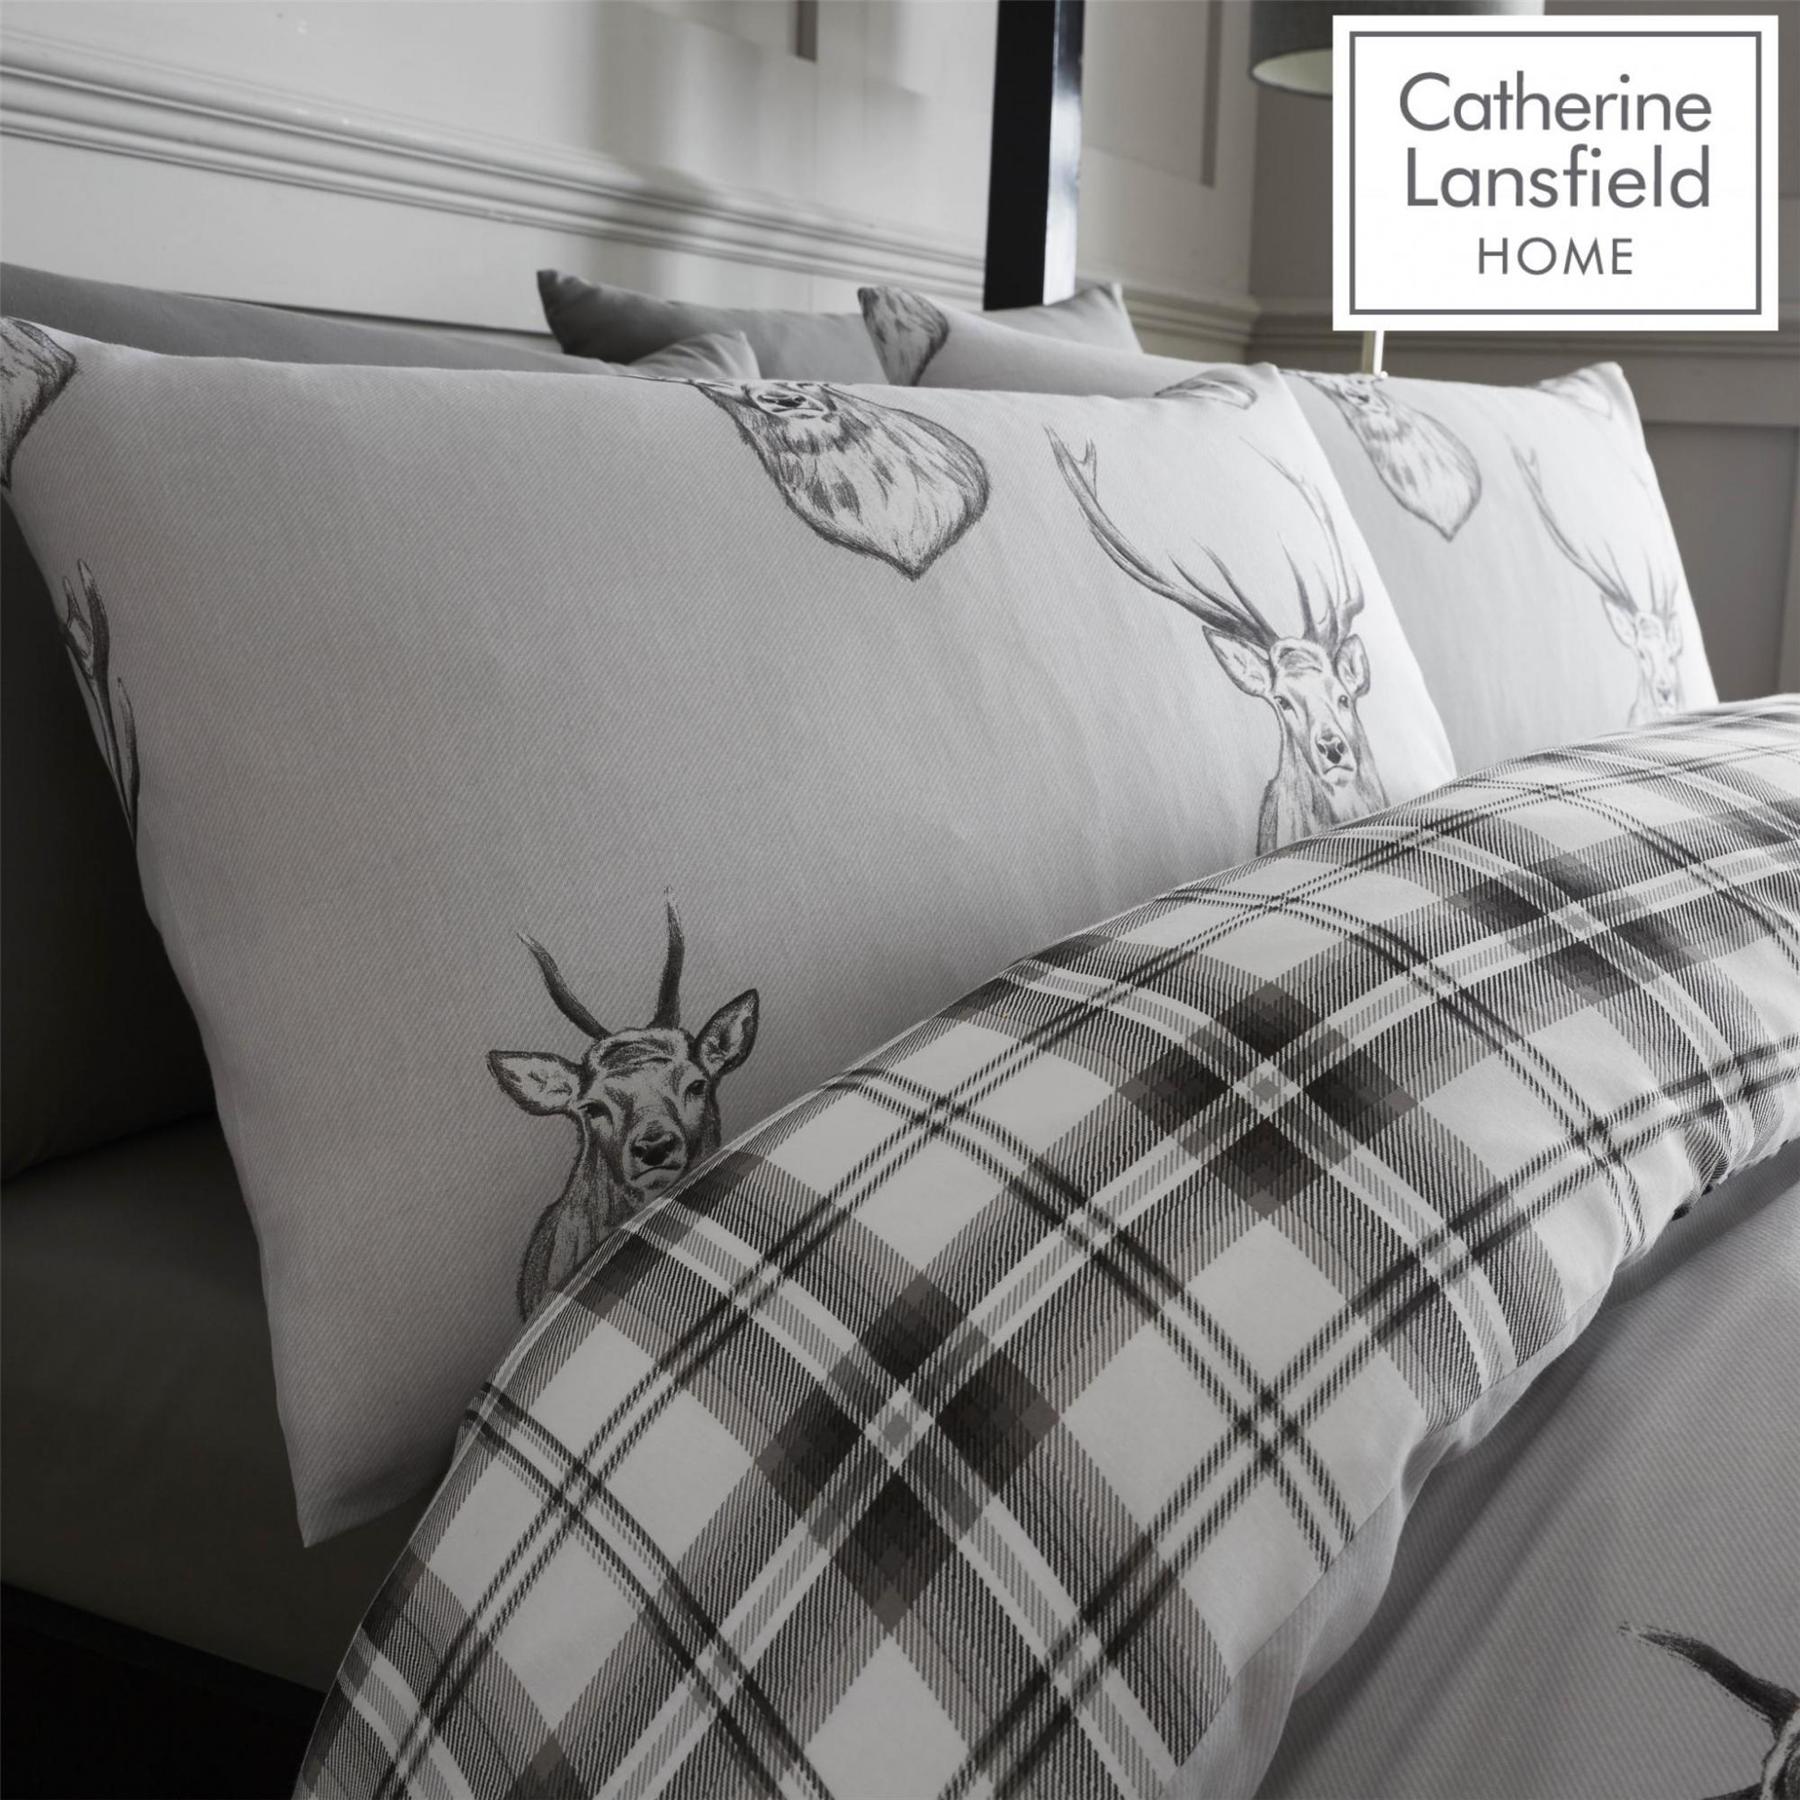 Catherine-Lansfield-Duvet-Set-Highland-Stag-Reversible-Check-Bedding-Grey thumbnail 24